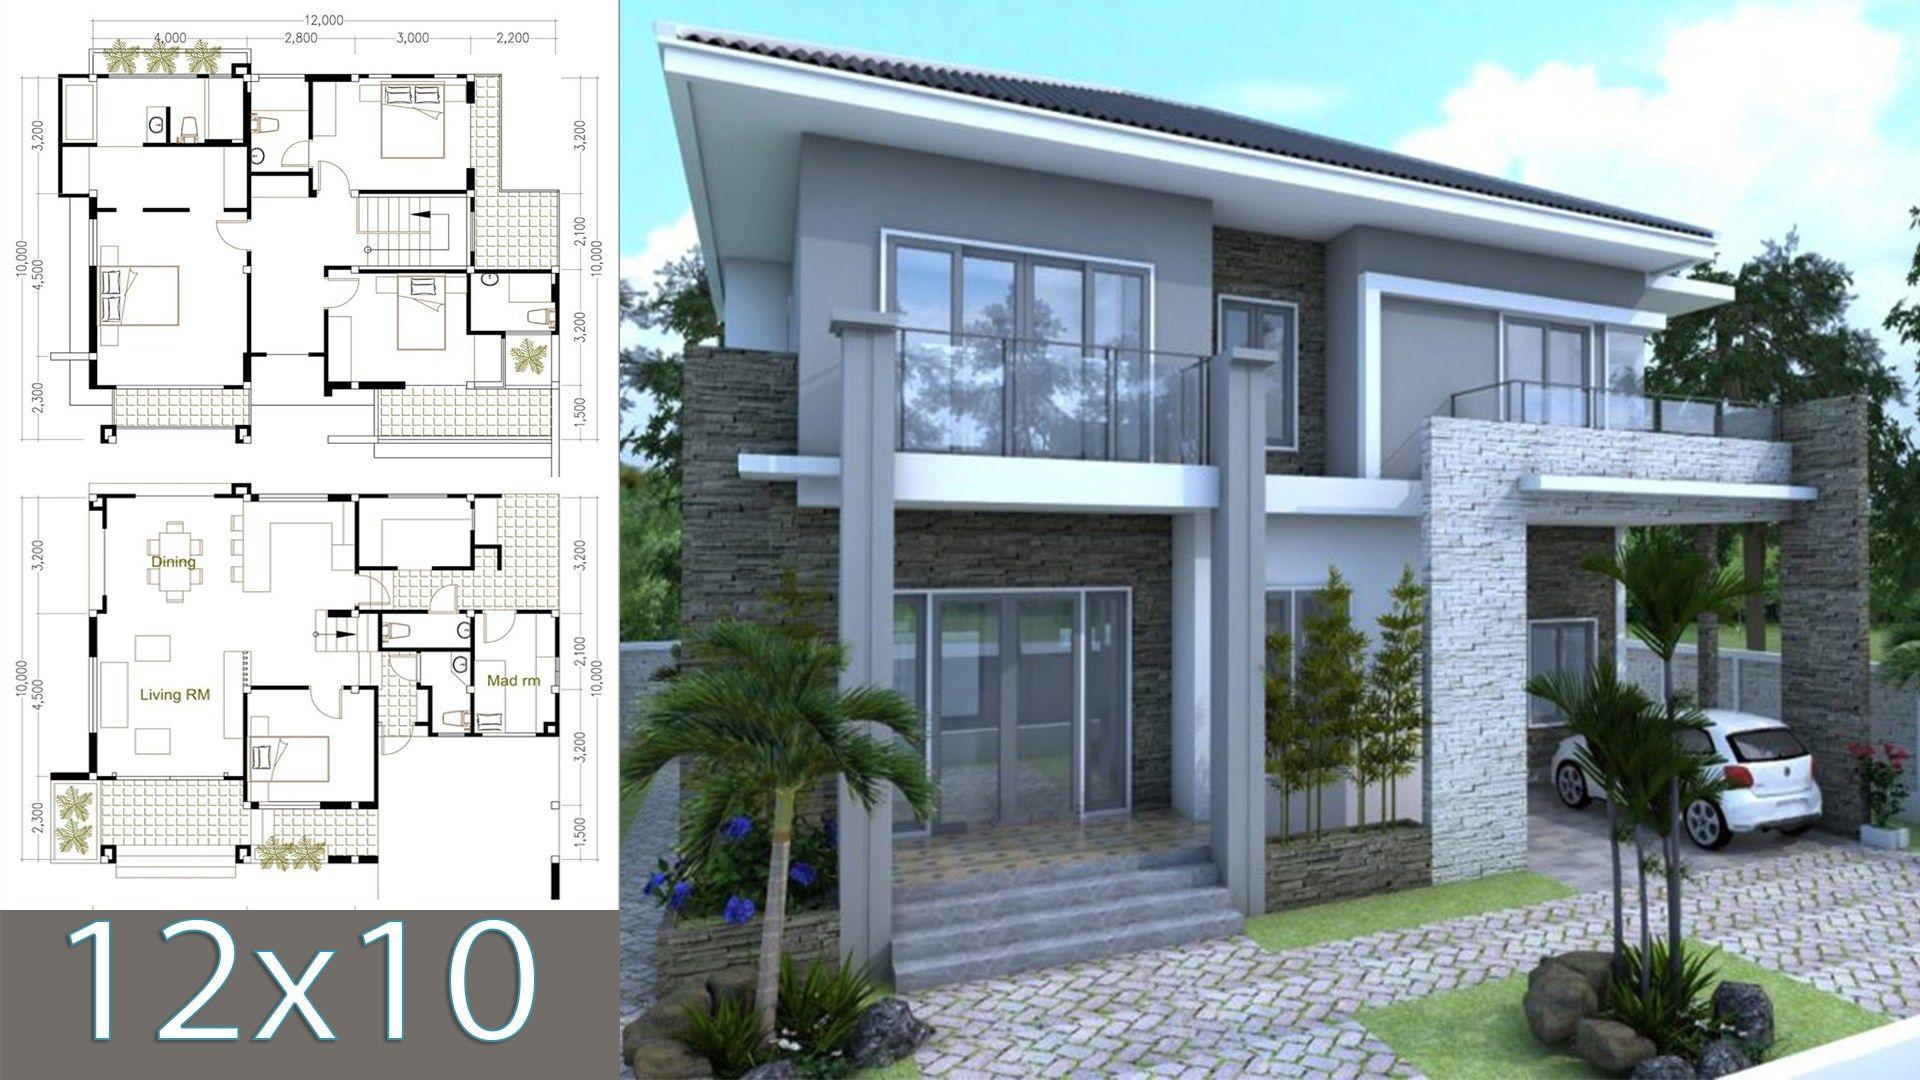 5 Bedrooms Modern Home 10x12m Samphoas Plan Modern House Plans Modern House Design Modern House